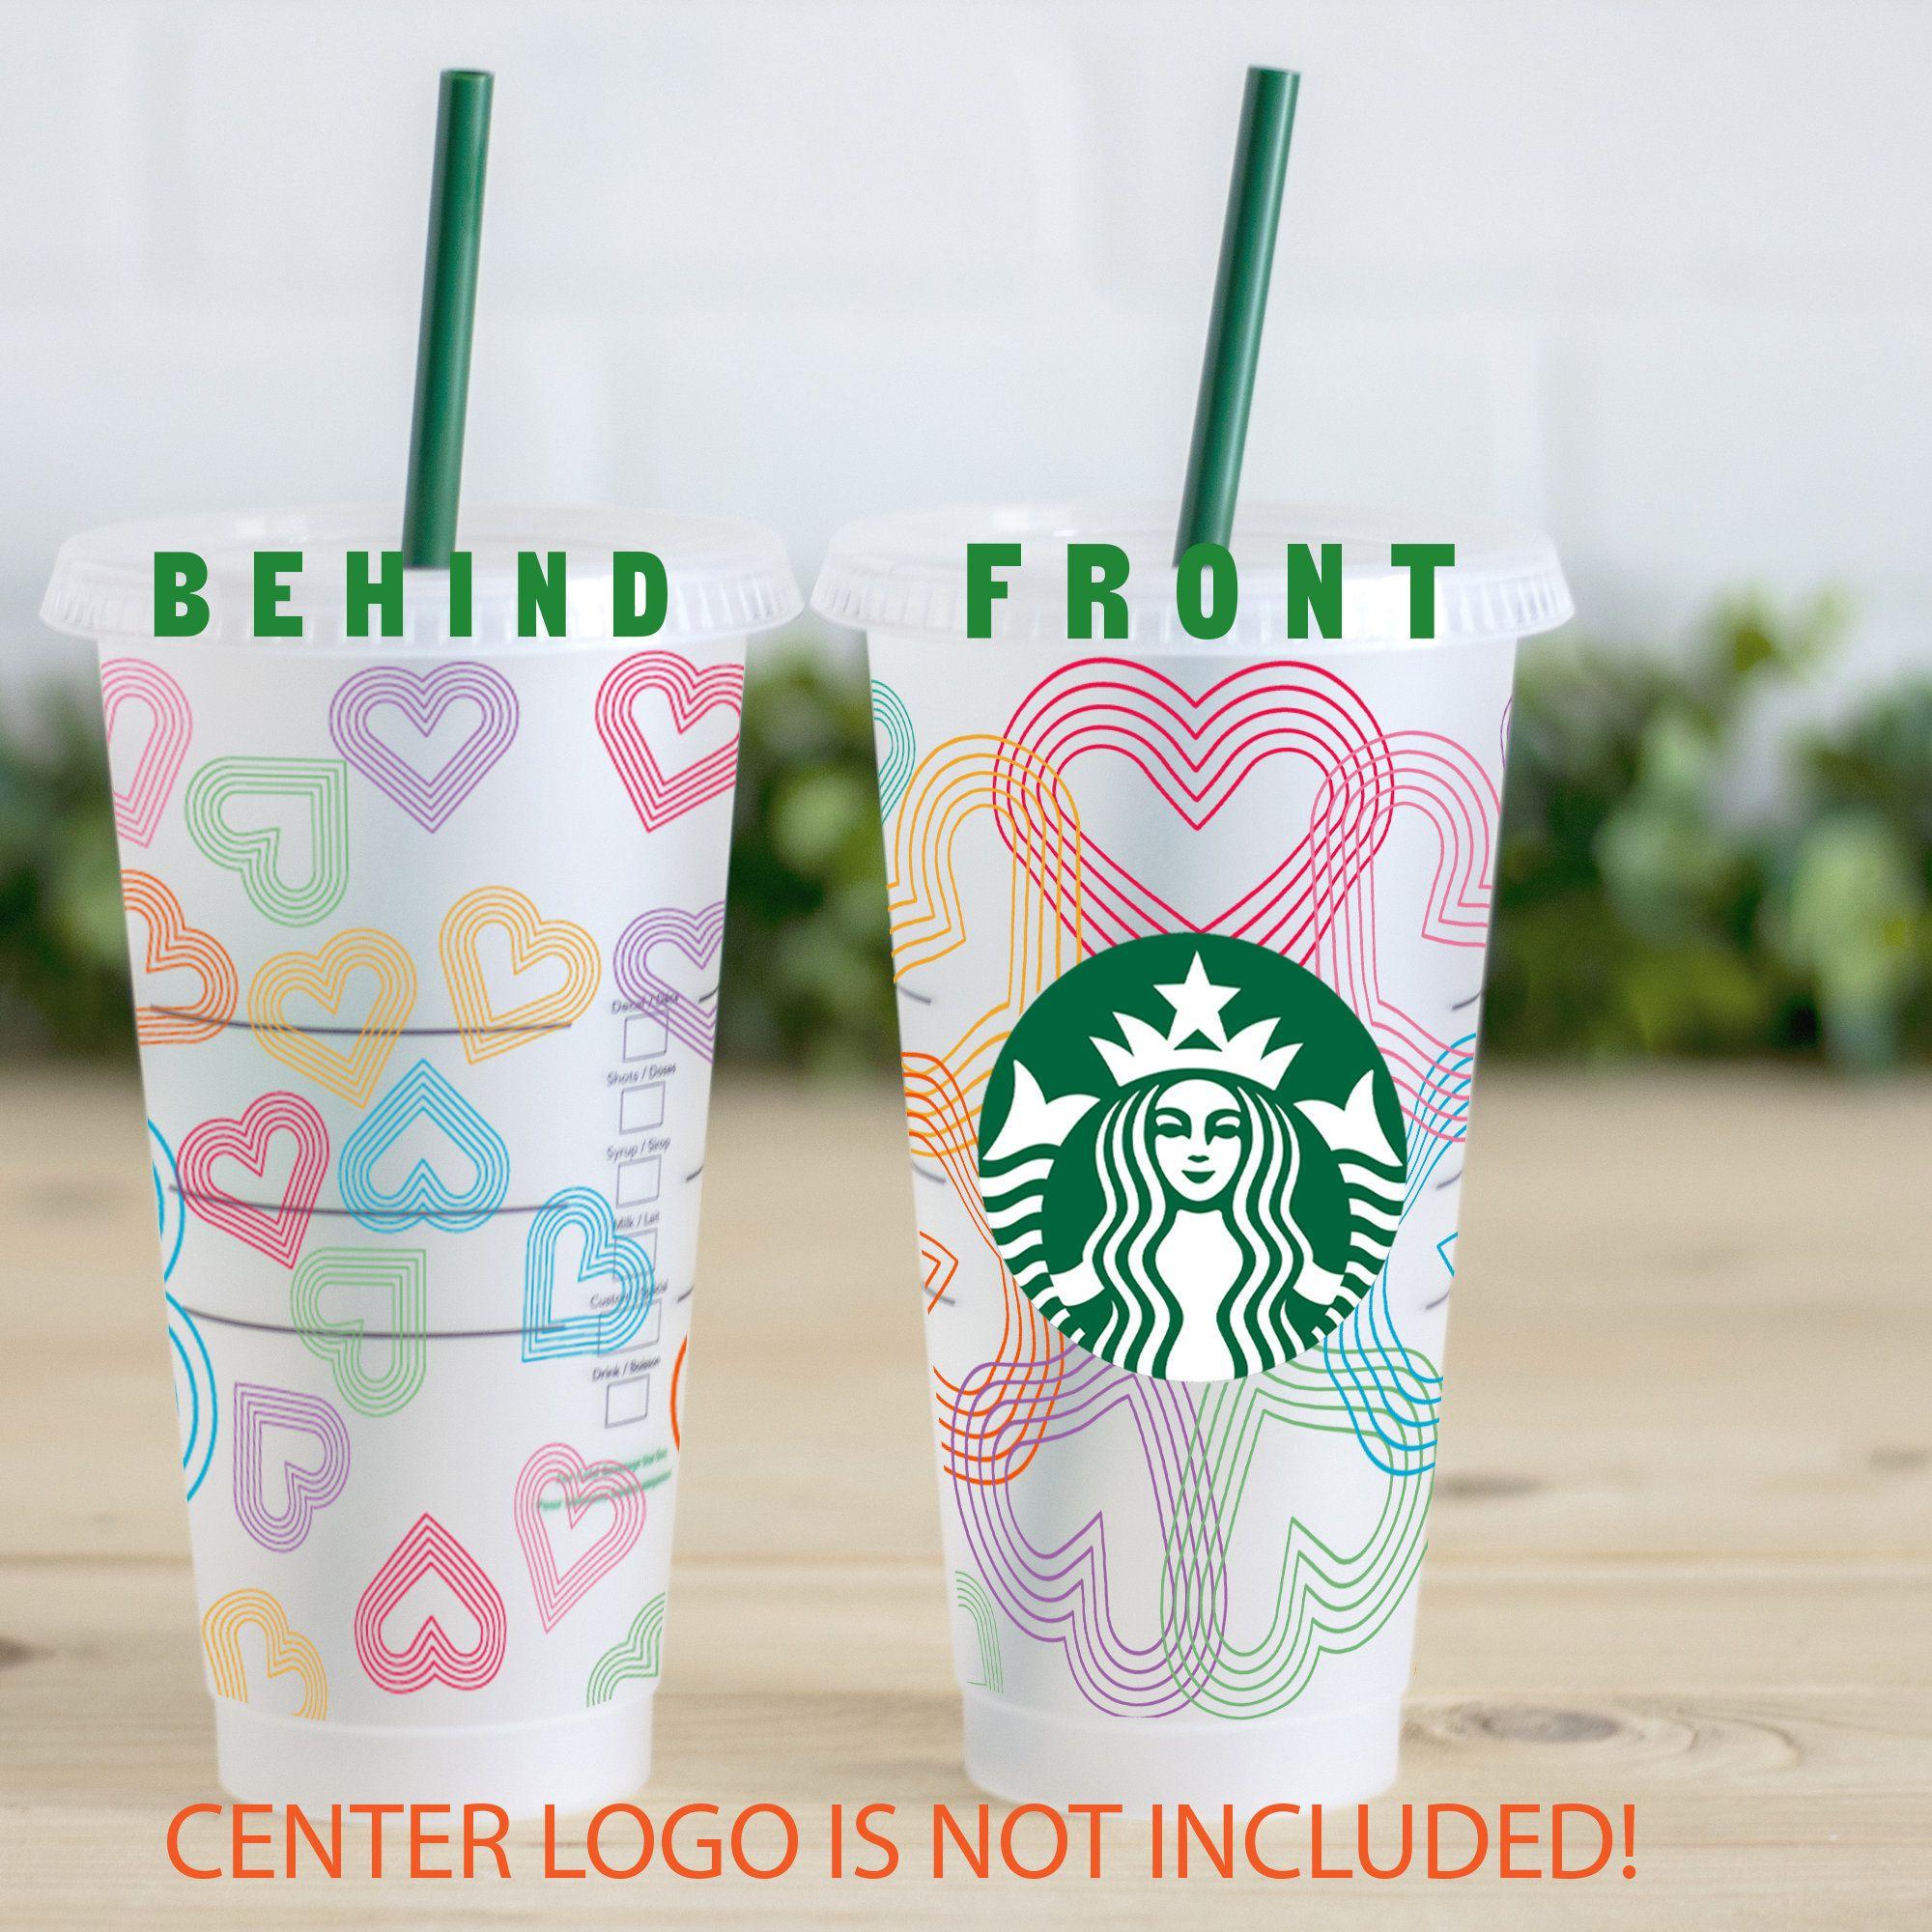 Starbucks Cup Starbucks Bts 3 Sty Leenti Cup 24 Oz Instant Download Starbucks Cup Svg Png Eps Zip